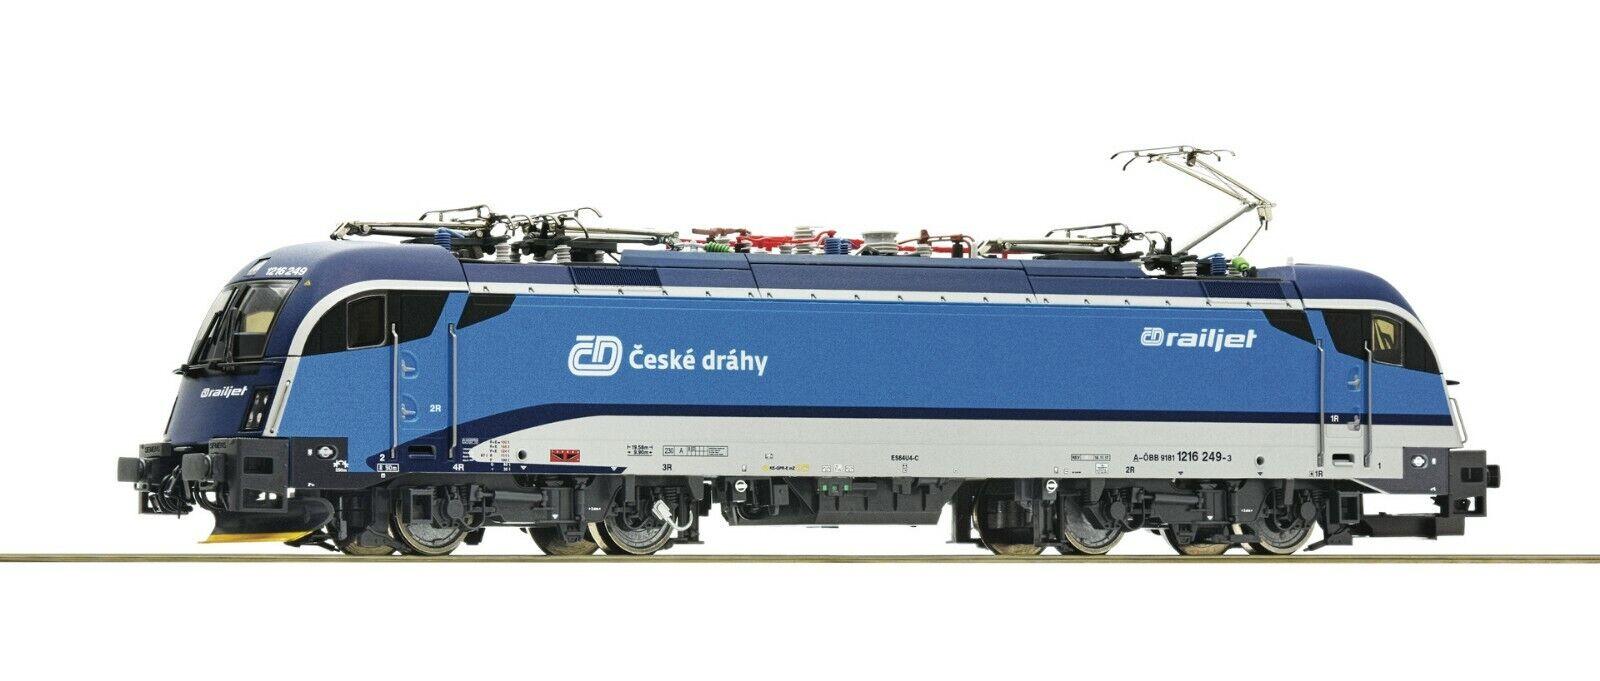 Roco HO Scale eléctrica Locomotora 1216 Railjet-Cd OBB